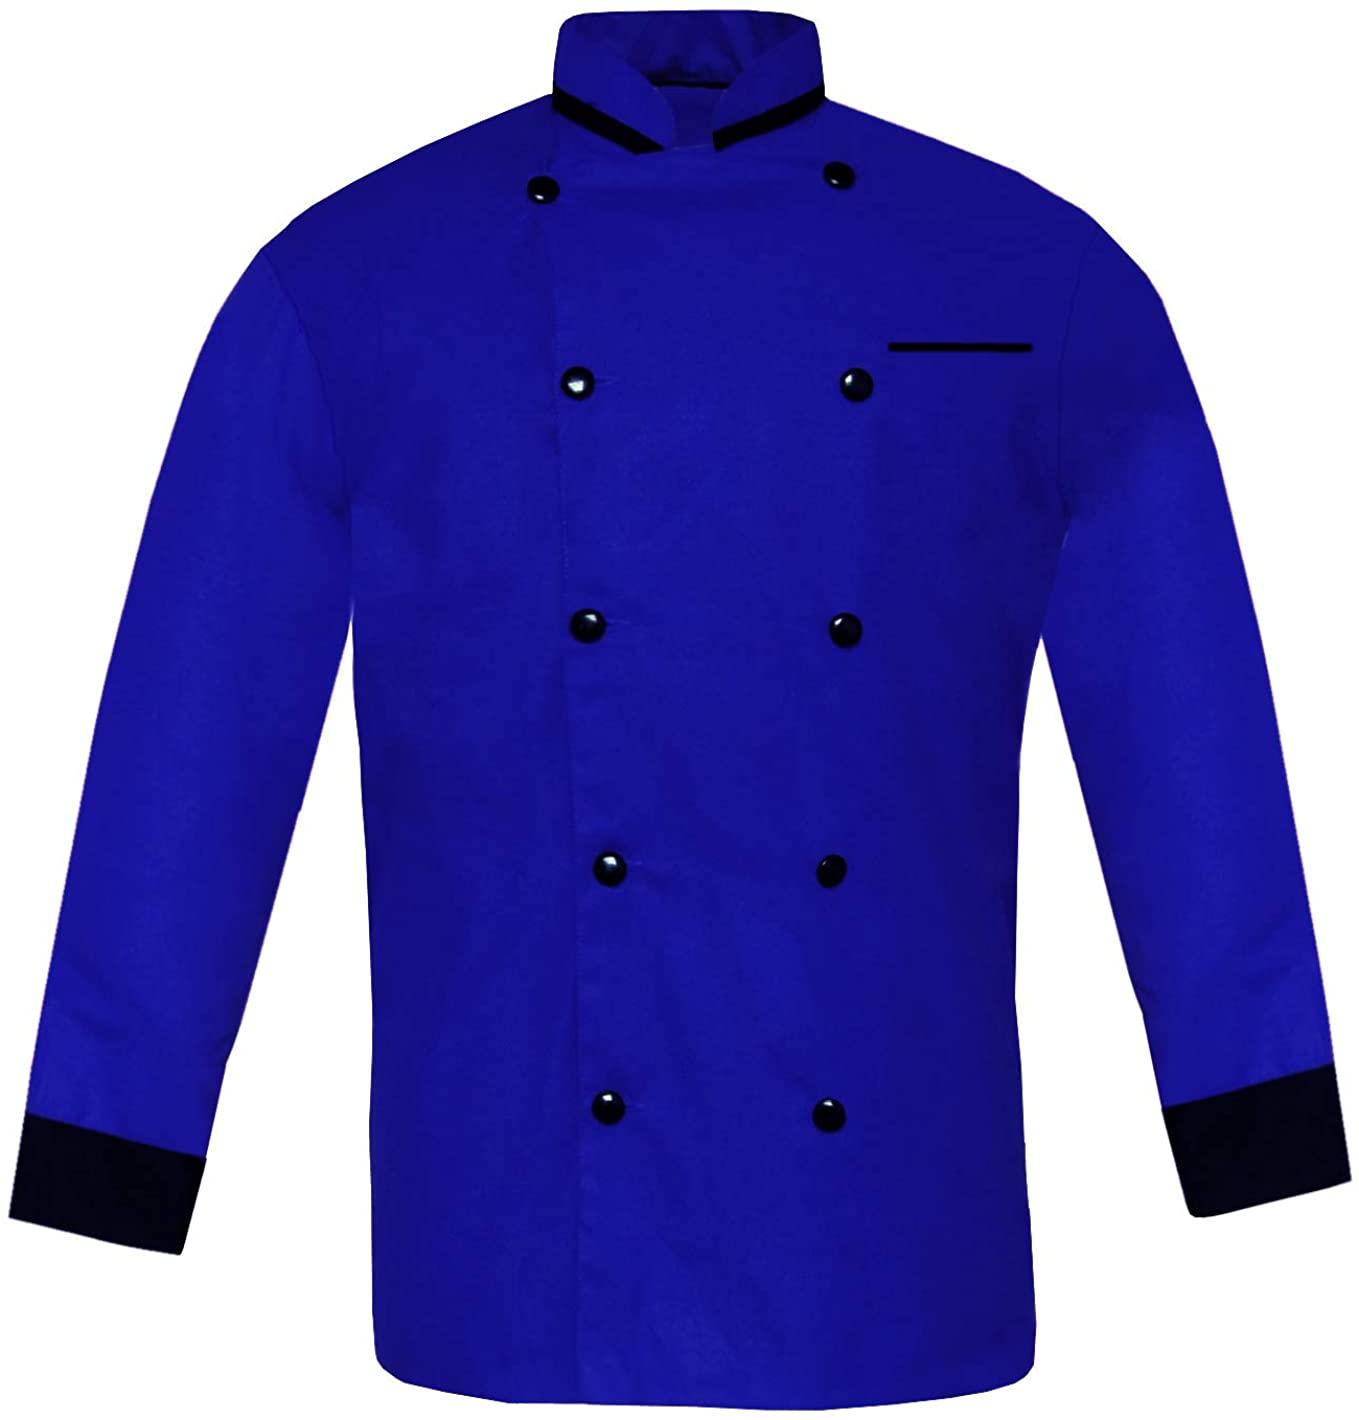 Leorenzo Modeling HA-04 Men Chef Jacket in 10 Colours (12 Sizes)